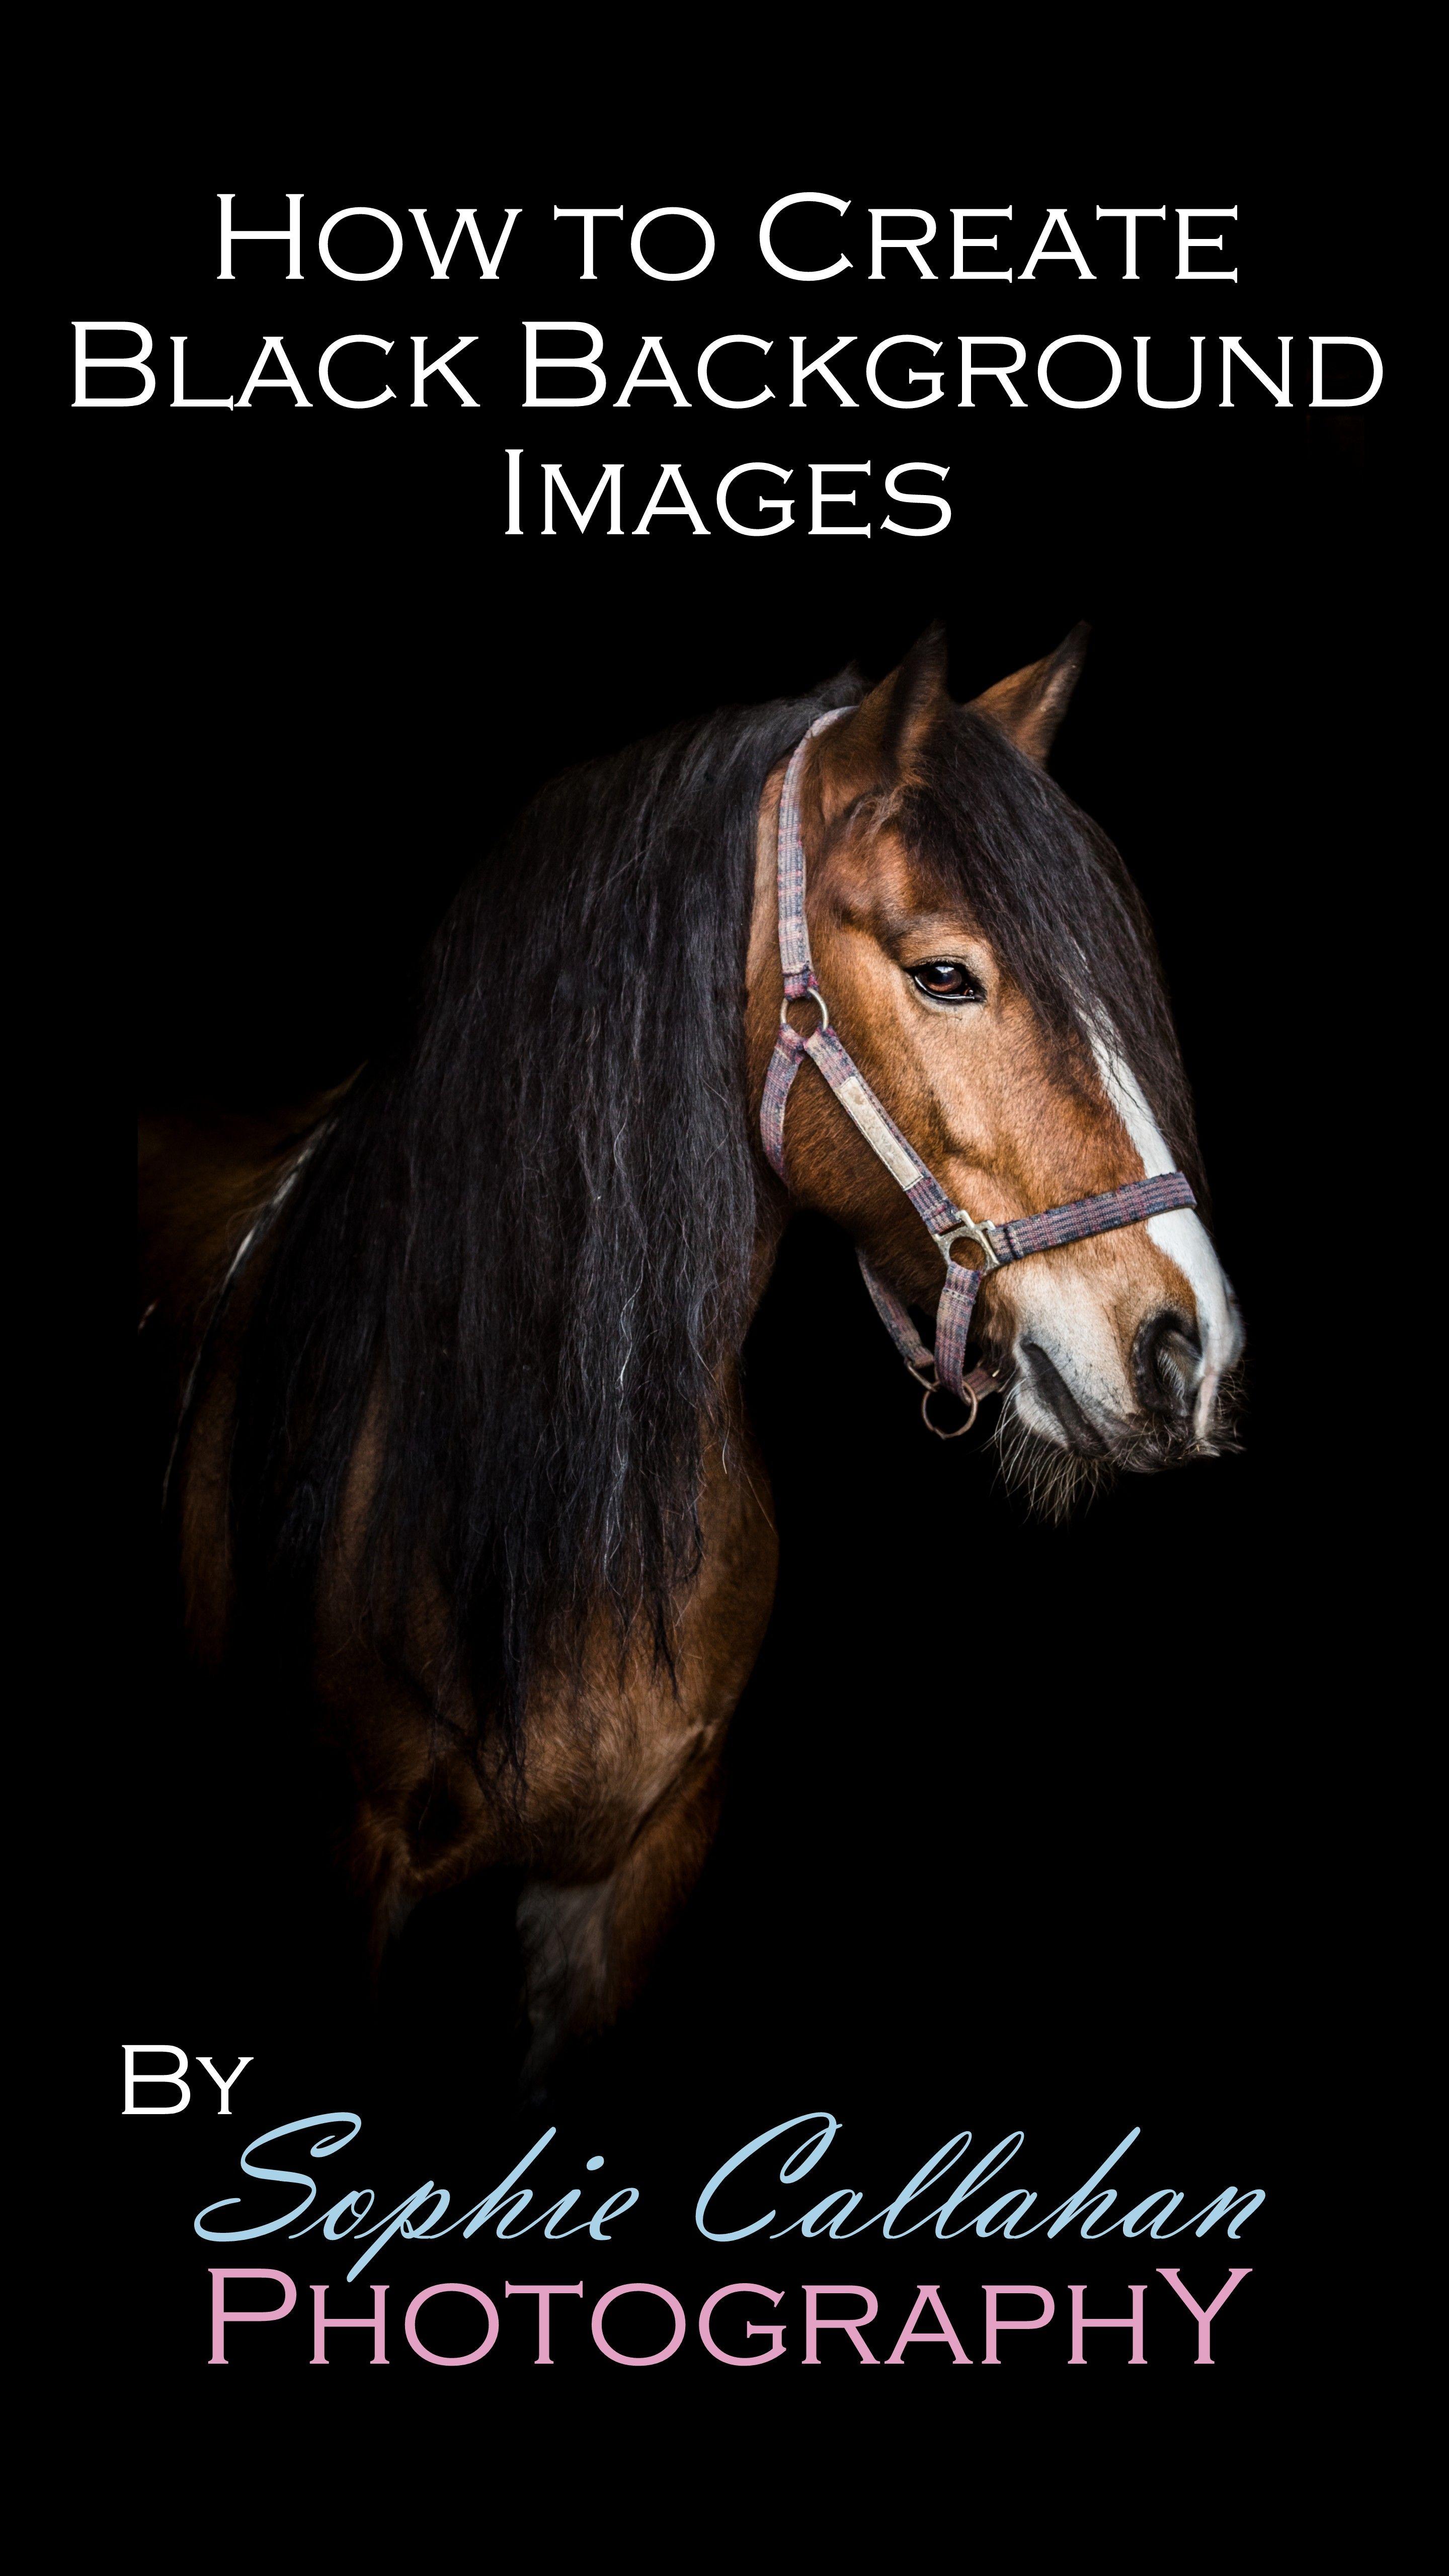 Black Background Shots Video Tutorial - by Specialist UK Equine Portrait  Photographer e82f34173df5